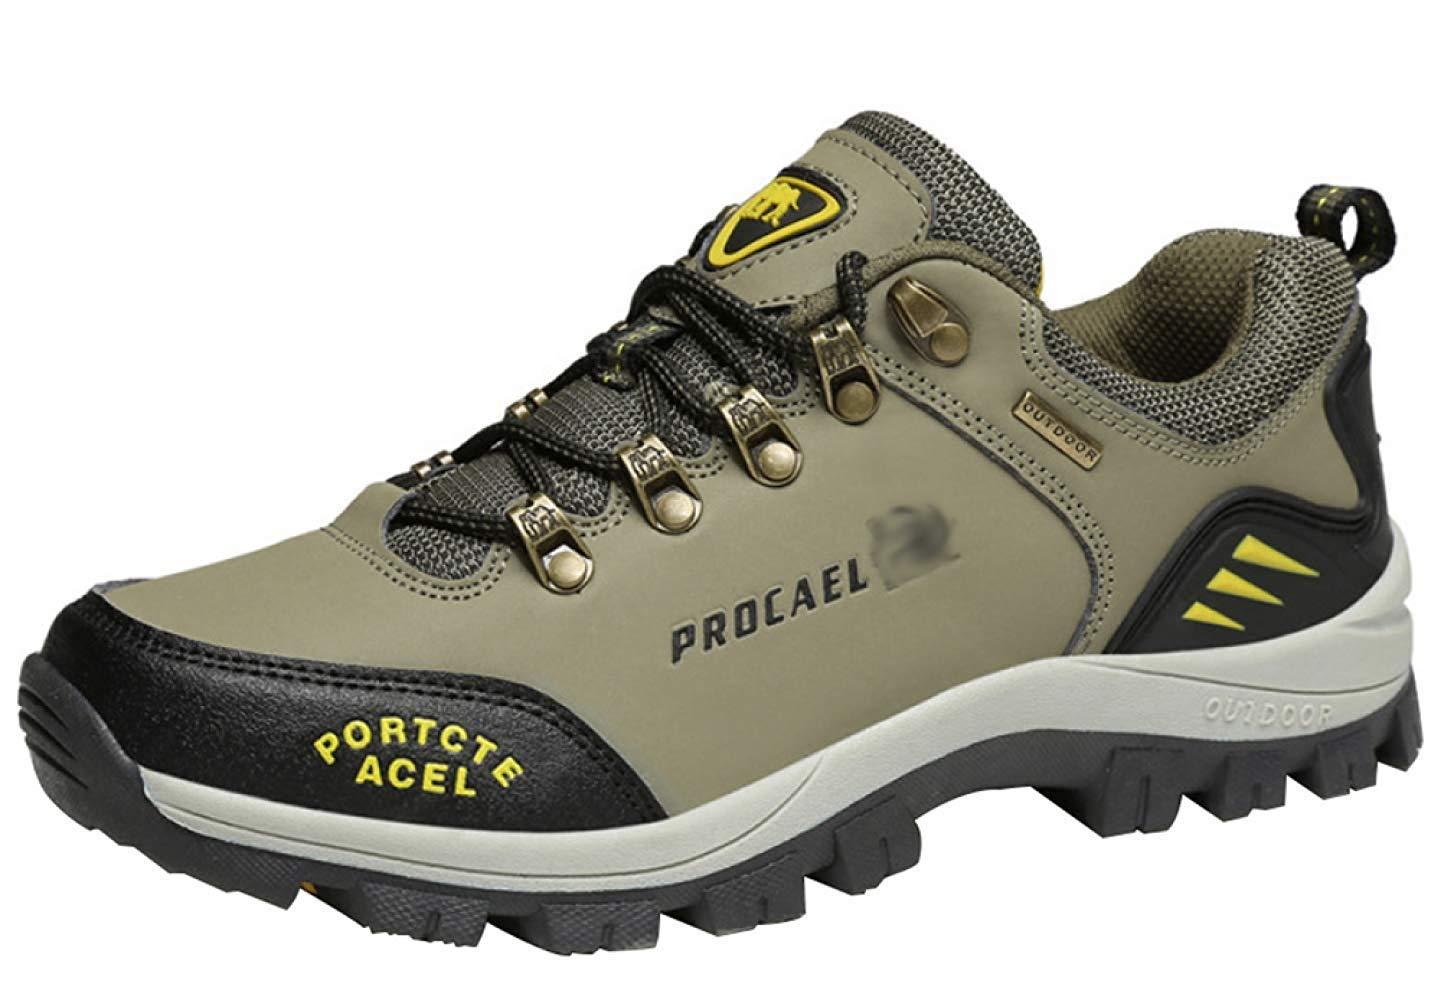 HhGold Männer Wanderschuhe Stiefel Leder Wanderschuhe Turnschuhe Für Outdoor Trekking Training Beiläufige Arbeit (Farbe : 13, Größe : 39EU)